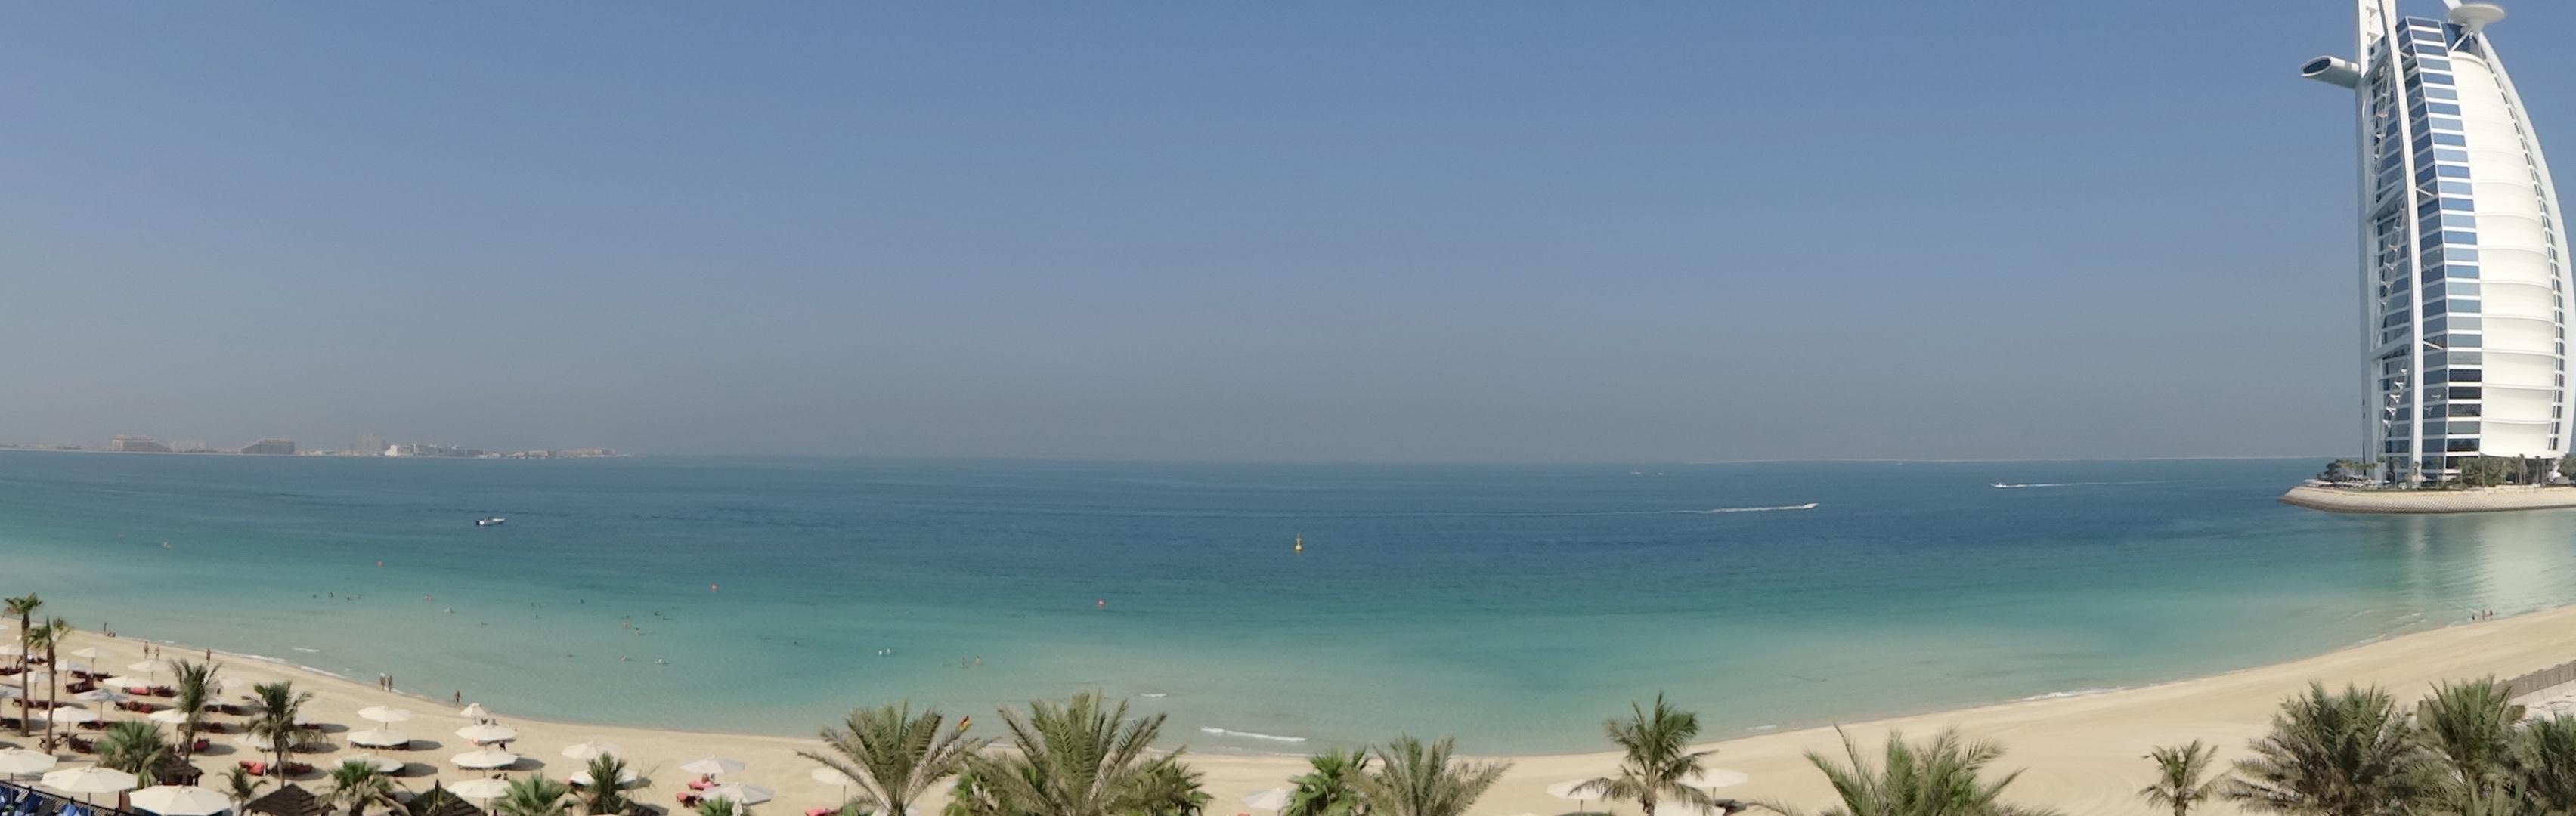 DSC01193 Dubai6 HappyFace313